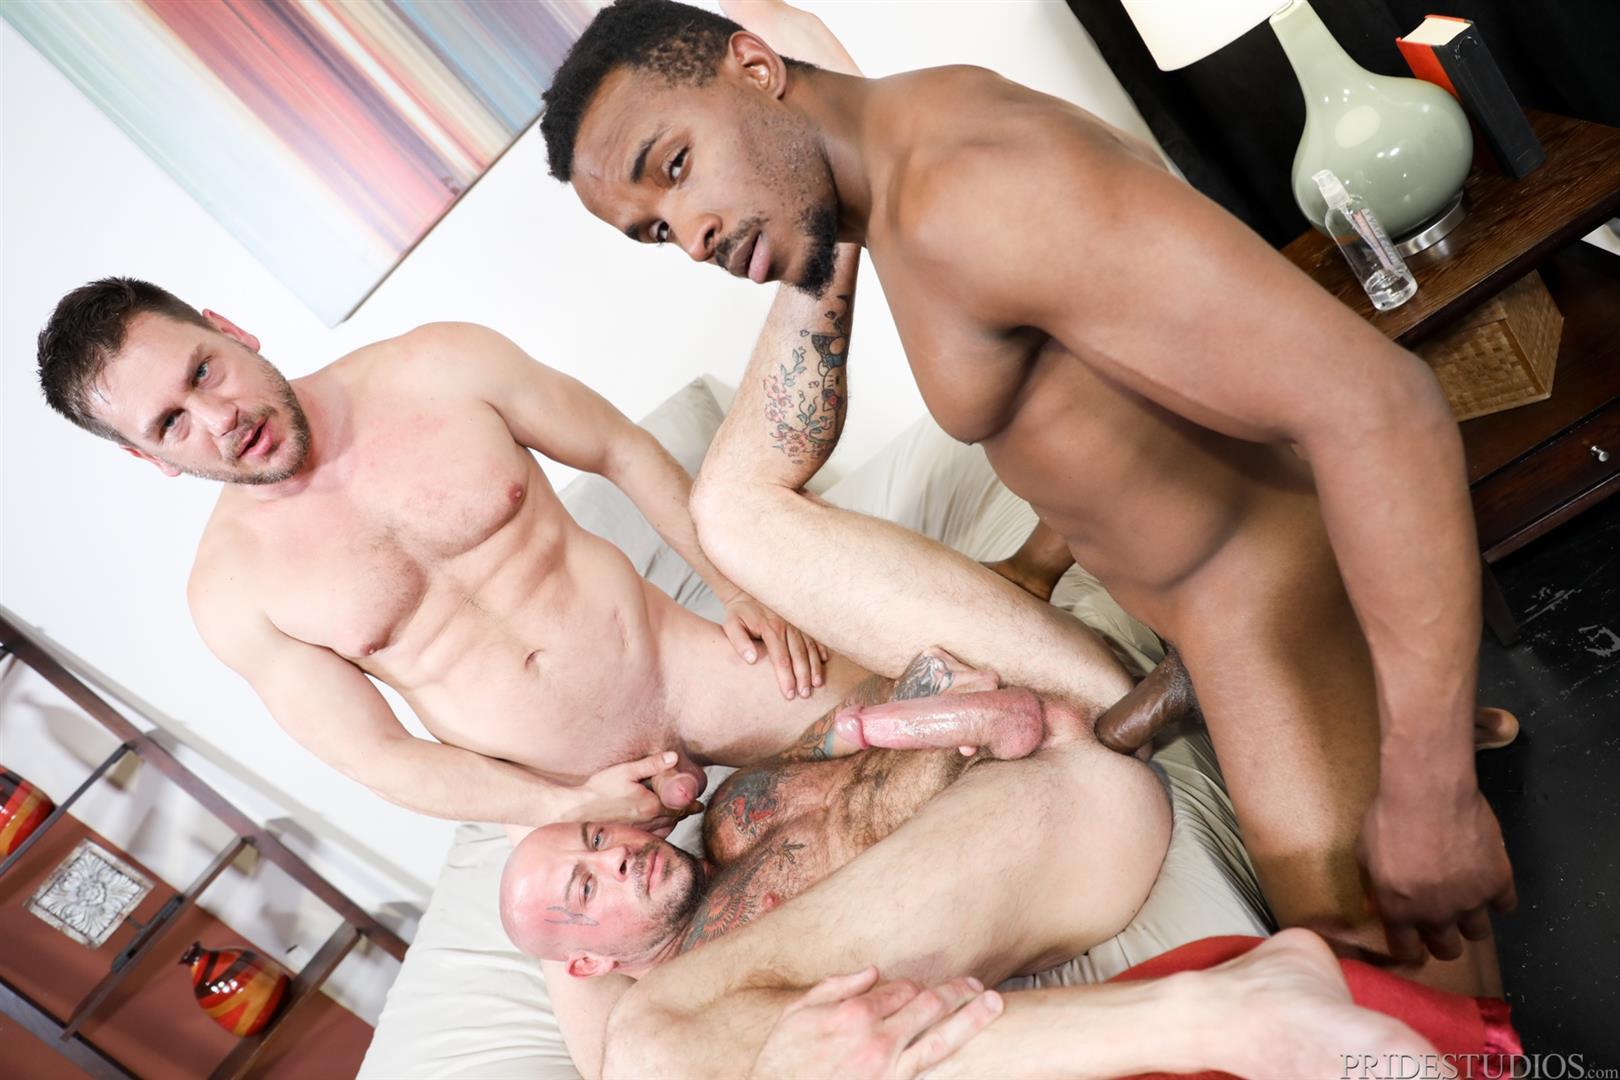 Extra-Big-Dicks-Sean-Duran-and-Hans-Berlin-and-Pheonix-Fellington-Interracial-Bareback-08 Muscle Daddies Sean Duran and Hans Berlin Share Pheonix Fellington's Big Black Cock